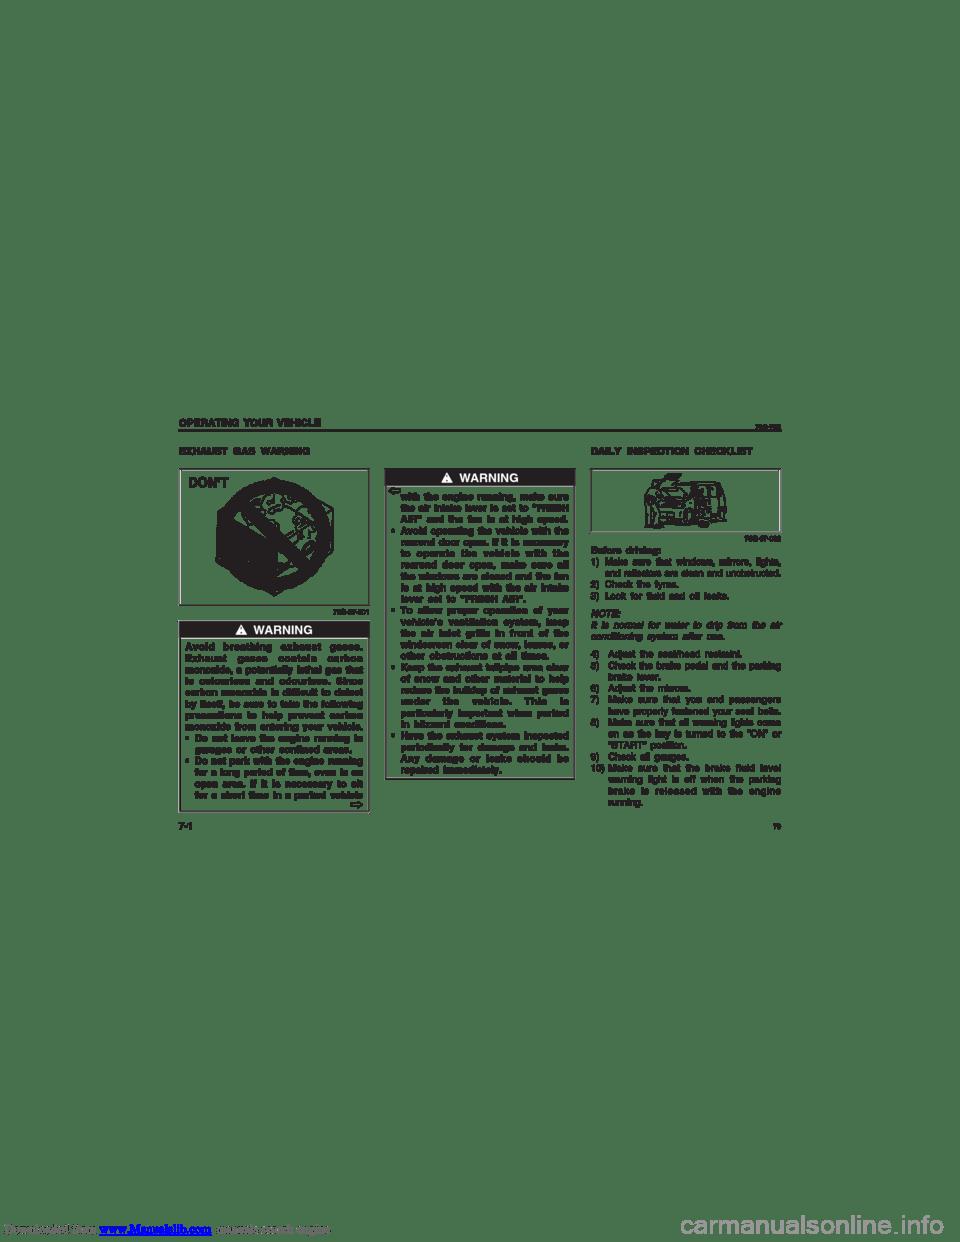 SUZUKI ALTO 2007 6.G Repair Manual (139 Pages)